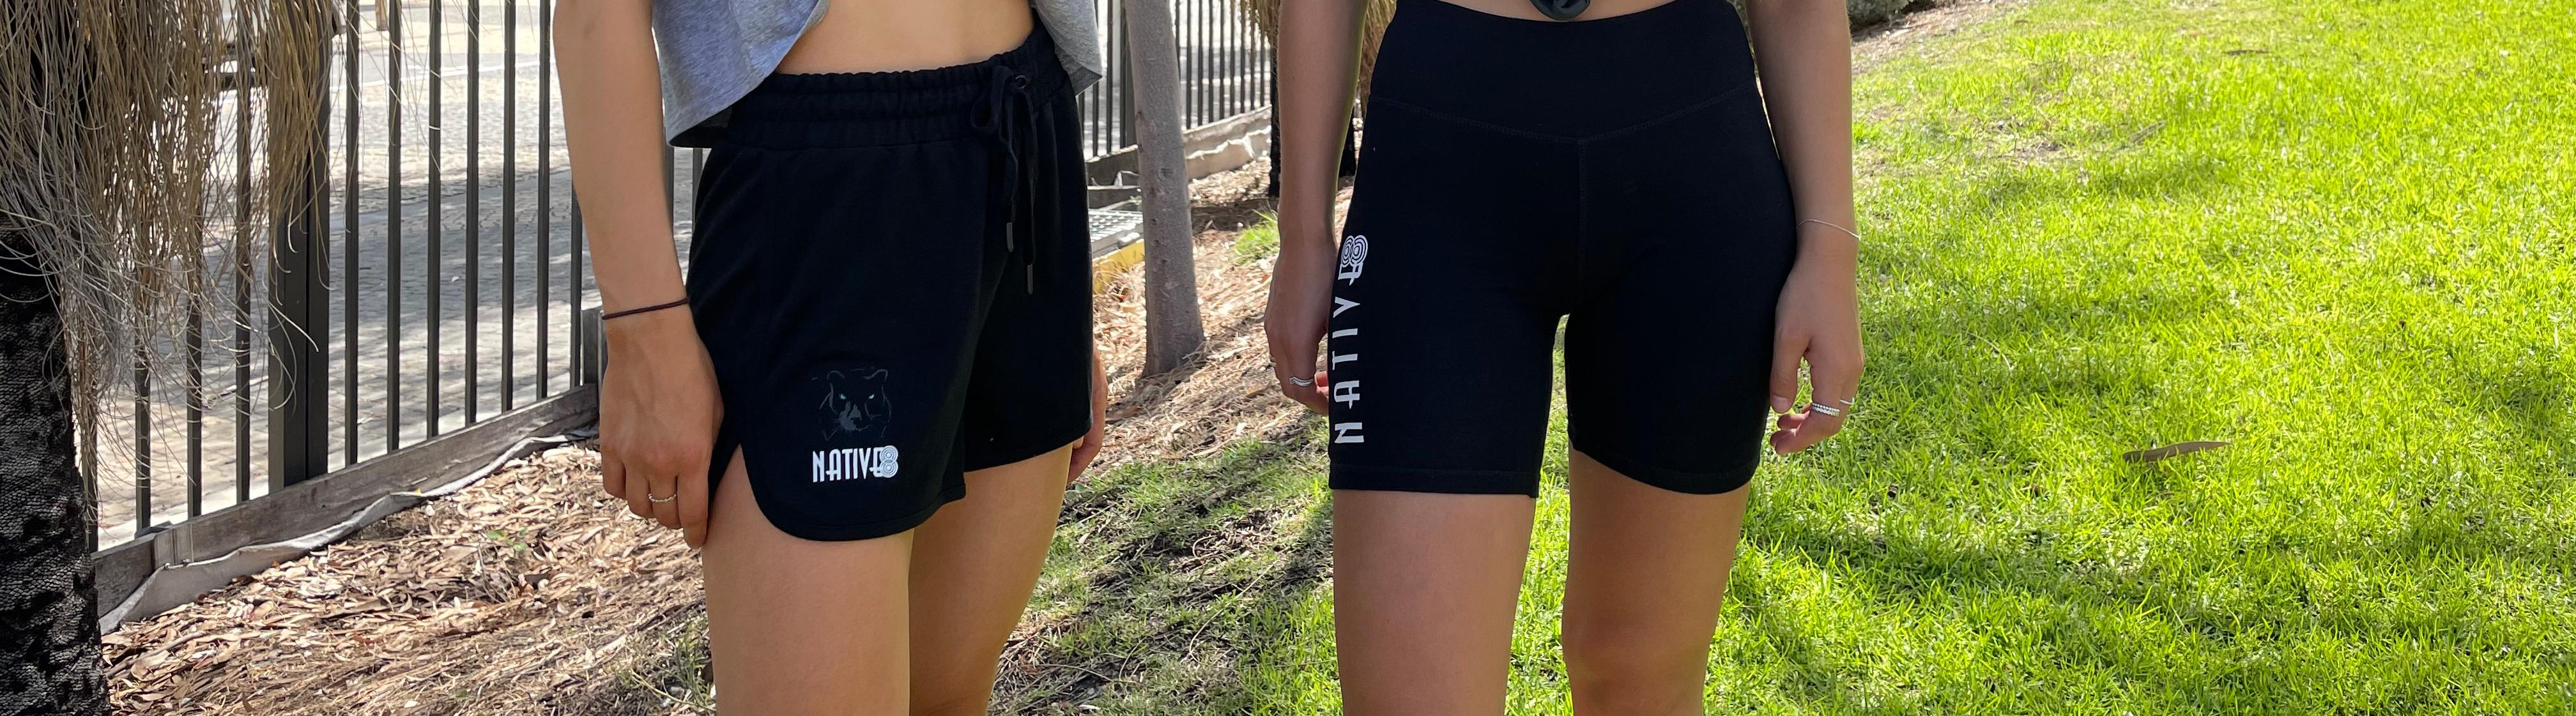 womens-shorts-header.jpg